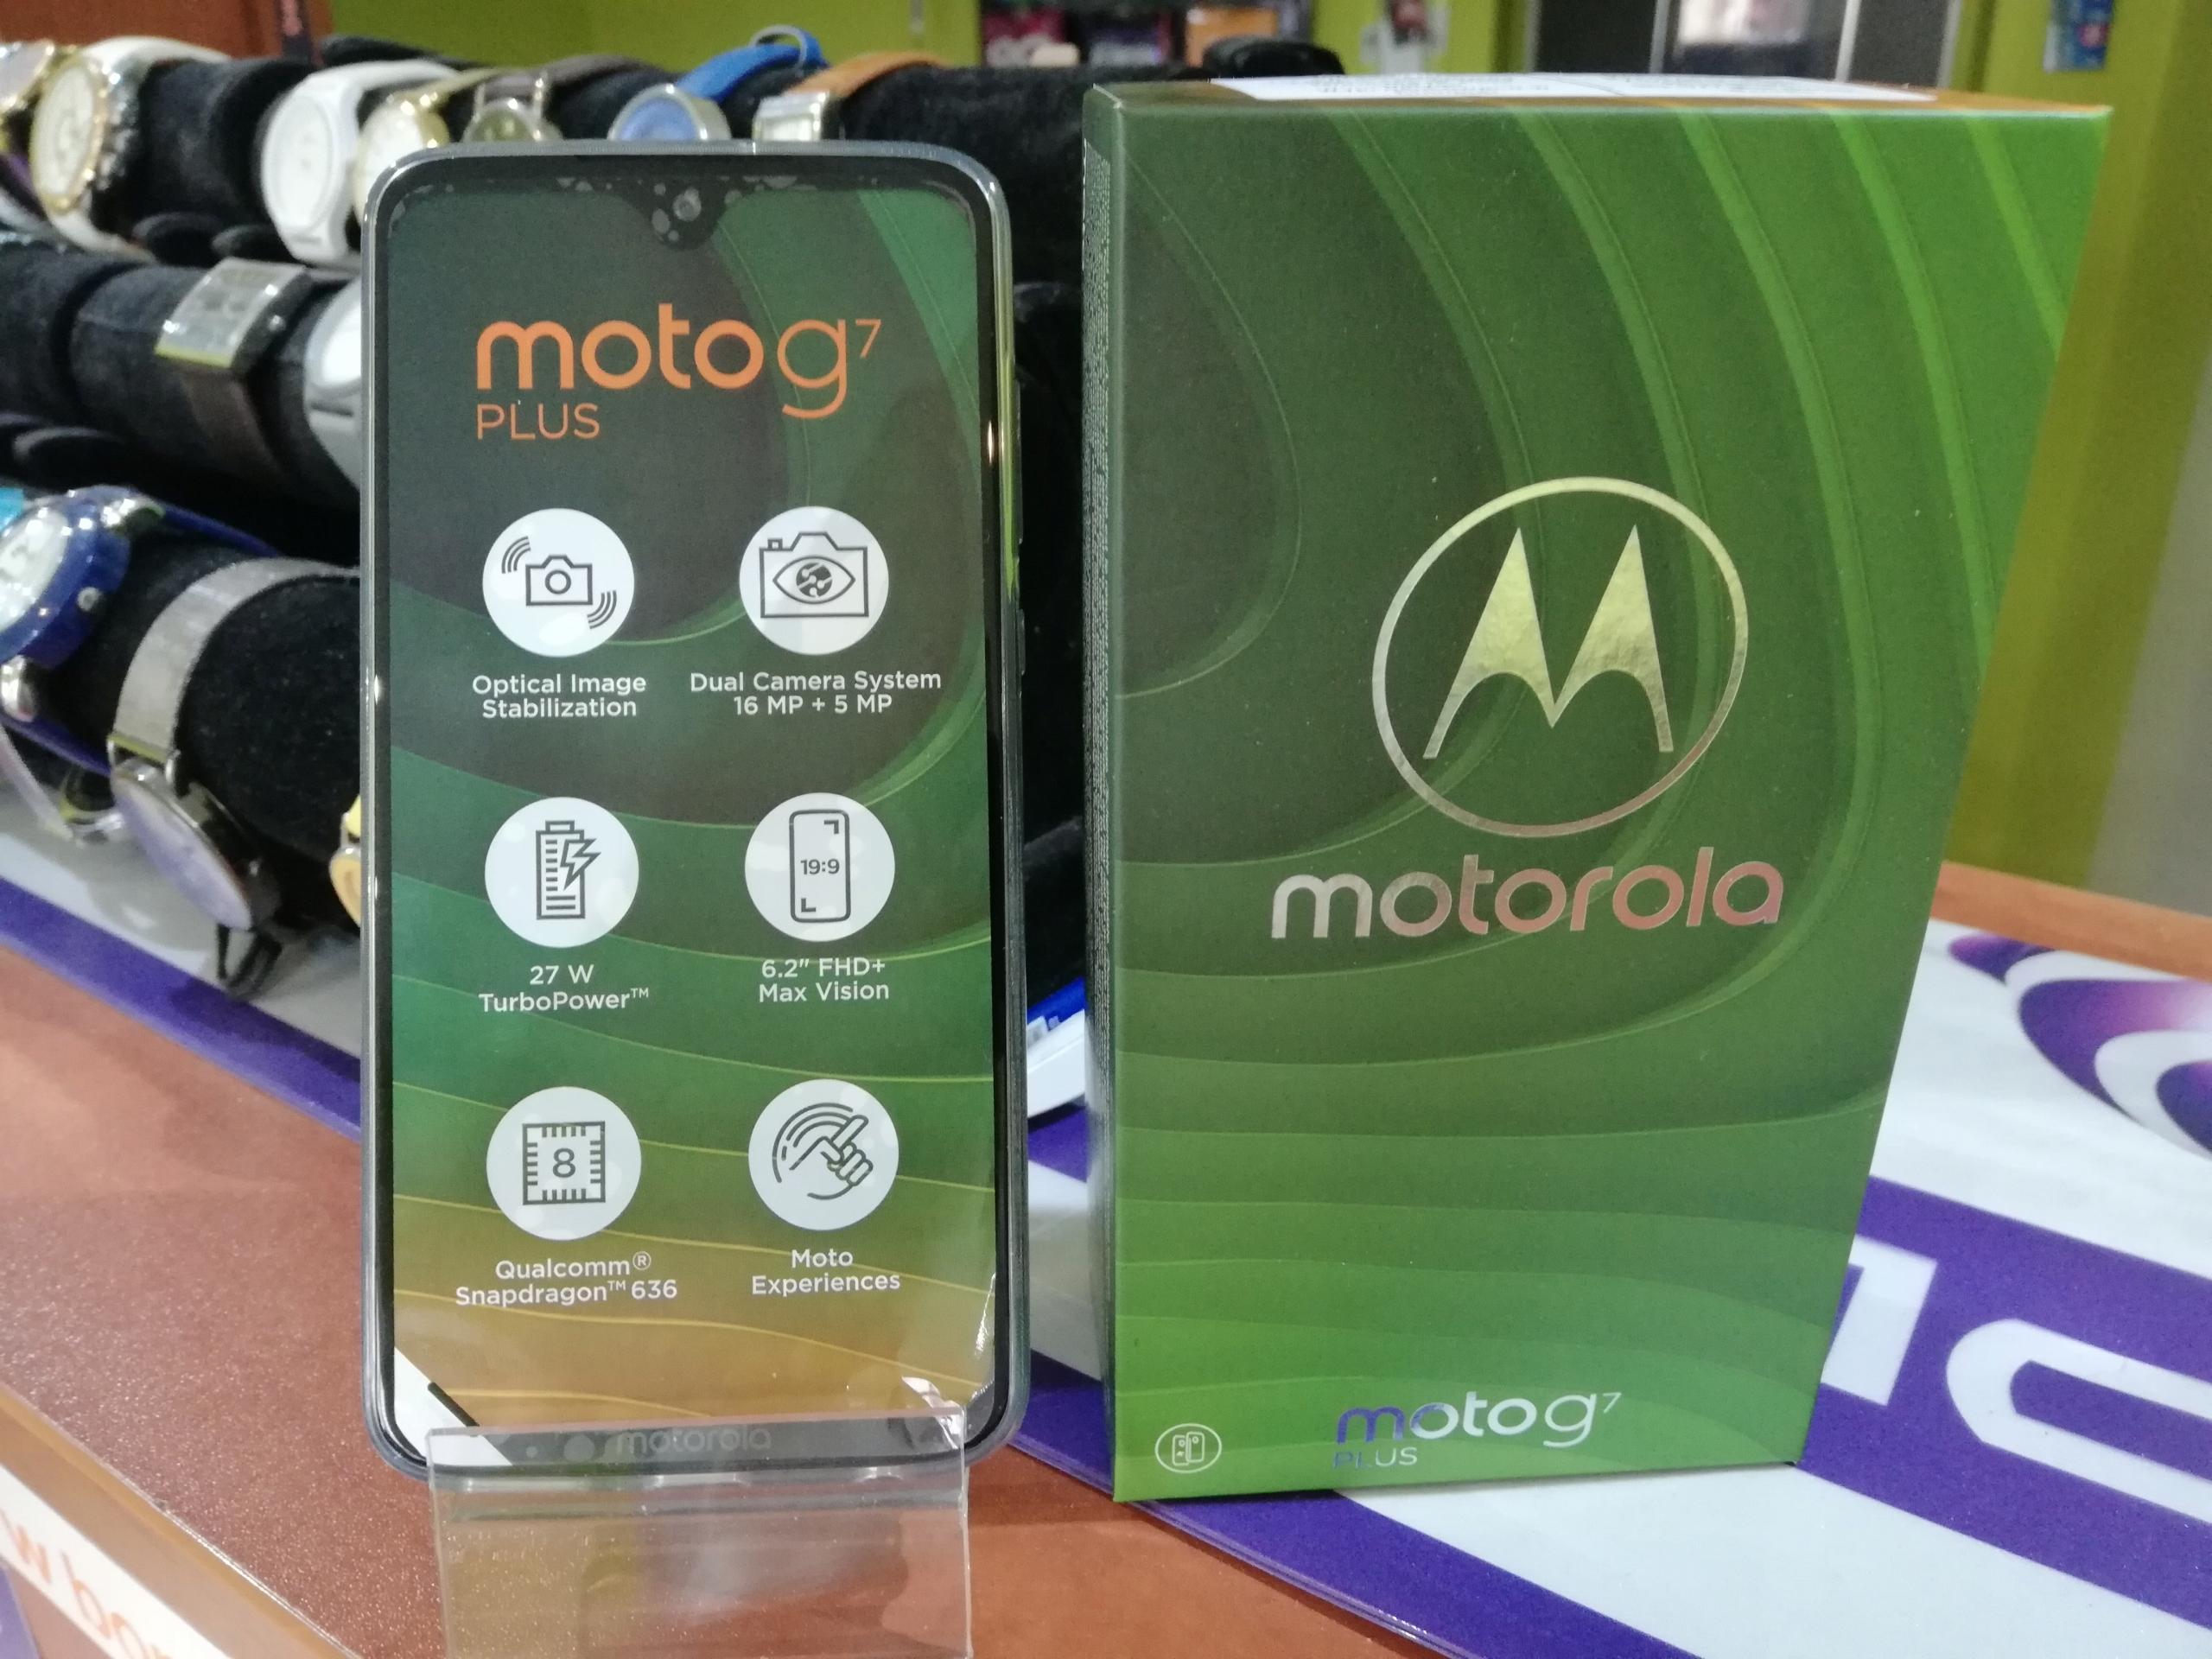 MOTOROLA Moto G7 Plus RAM 4 64GB DualSIM GW 24MC